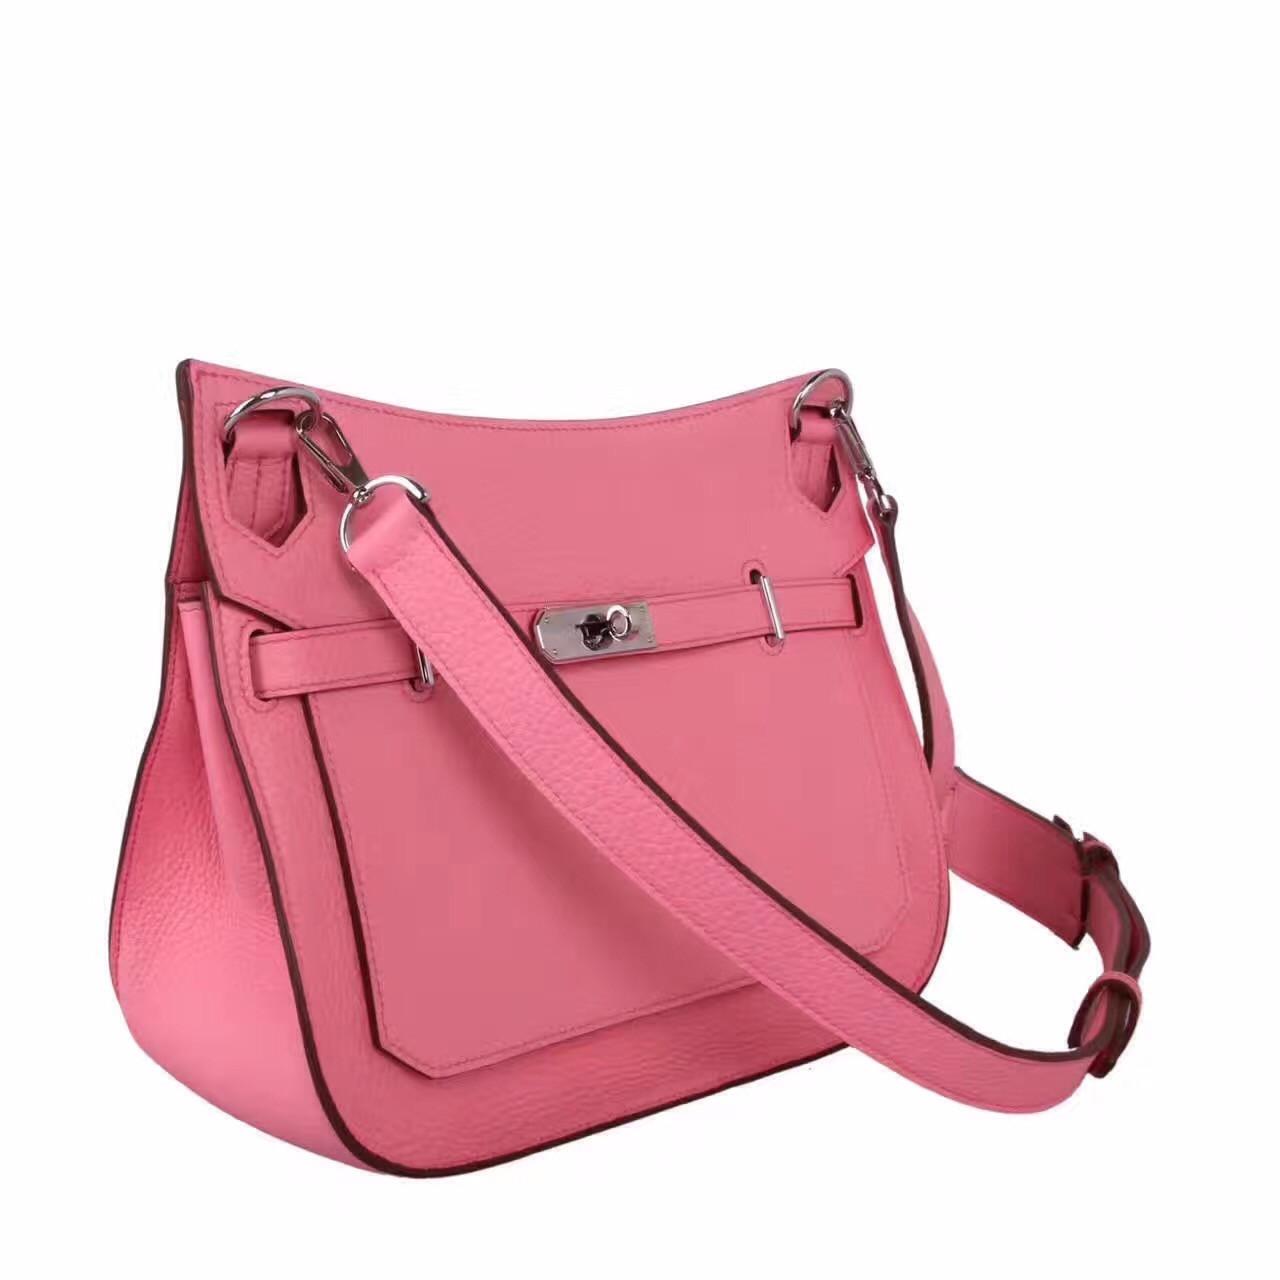 6aedab9ea47b4 Hermes Rose Sakura Jypsiere 28 bag - Bella Vita Moda